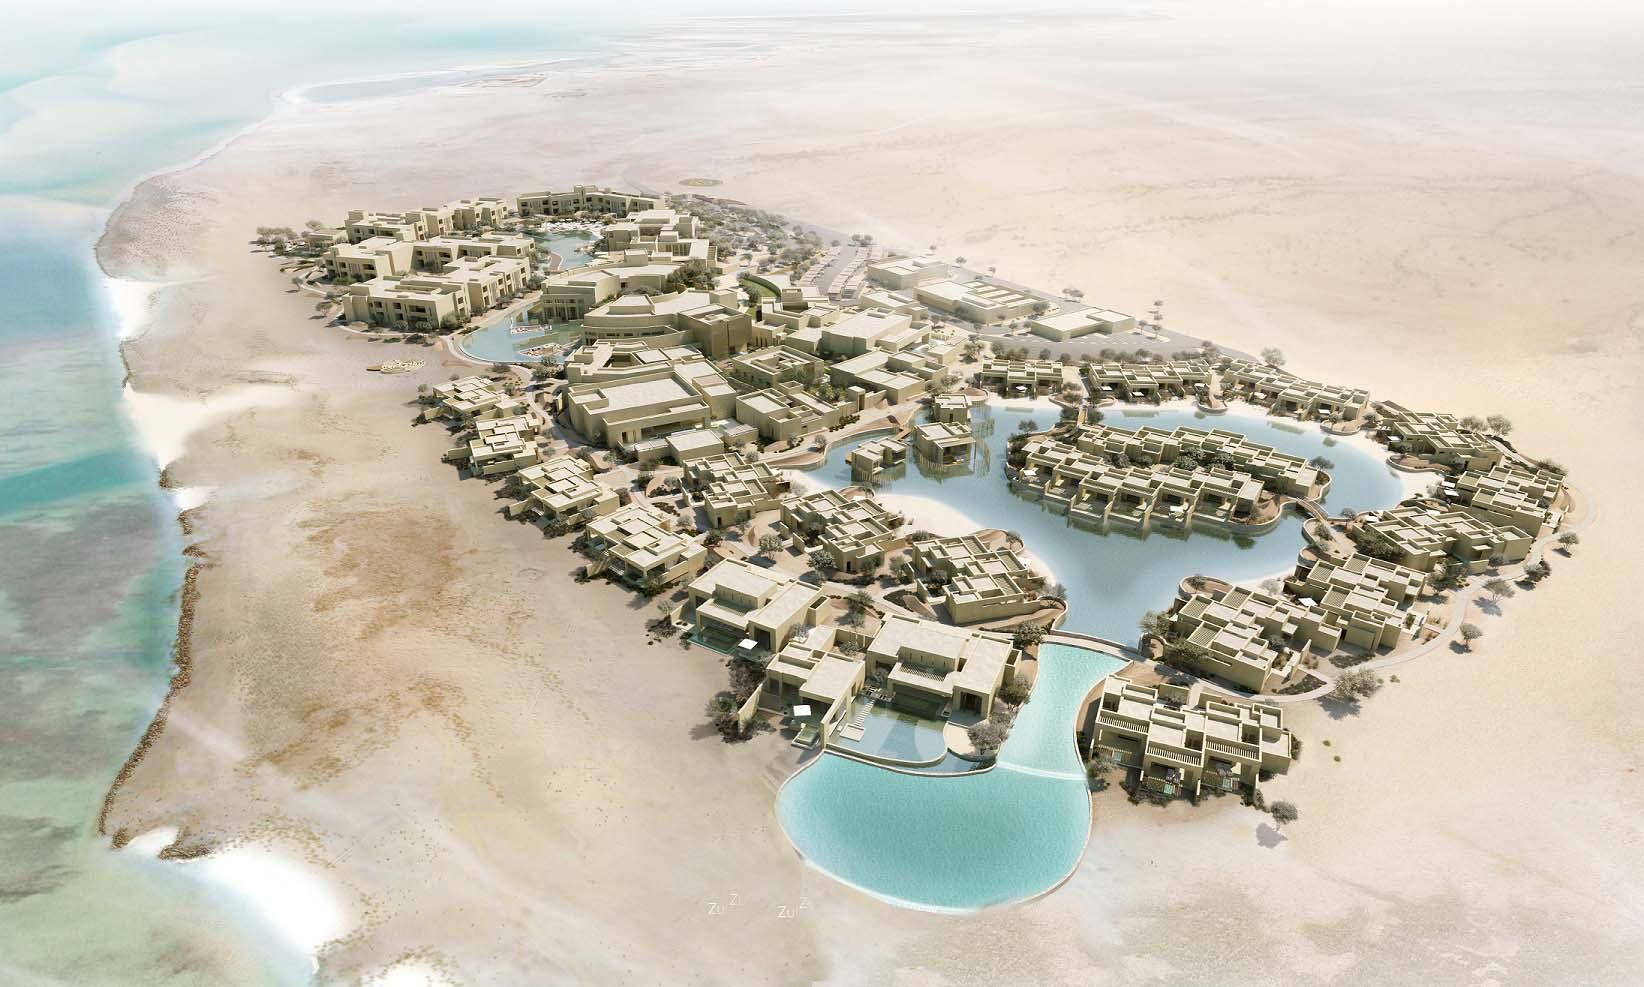 Msheireb to open new luxury resort on Qatar's coast - Doha News